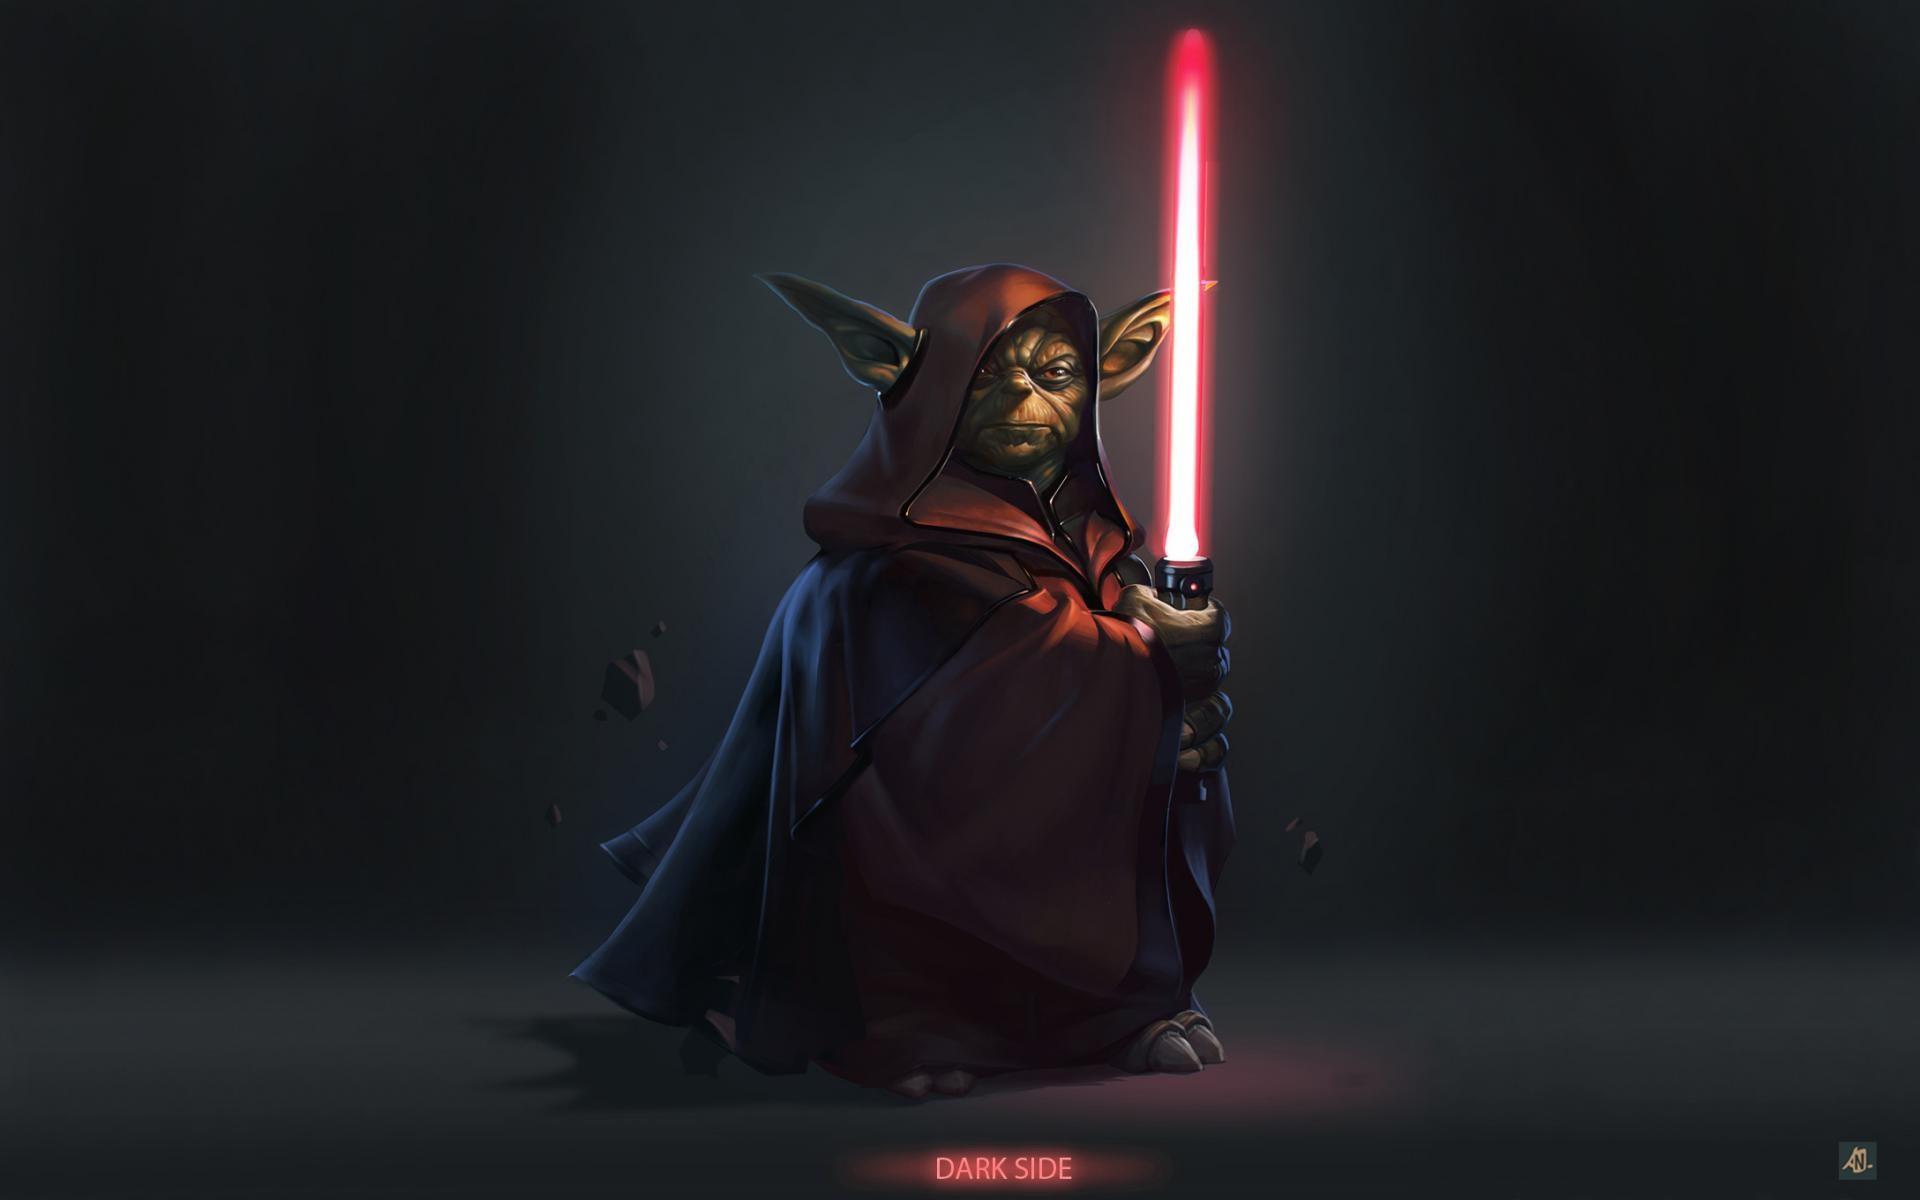 dark side Yoda Hollywood photomanipulation wallpaper background 1920x1200